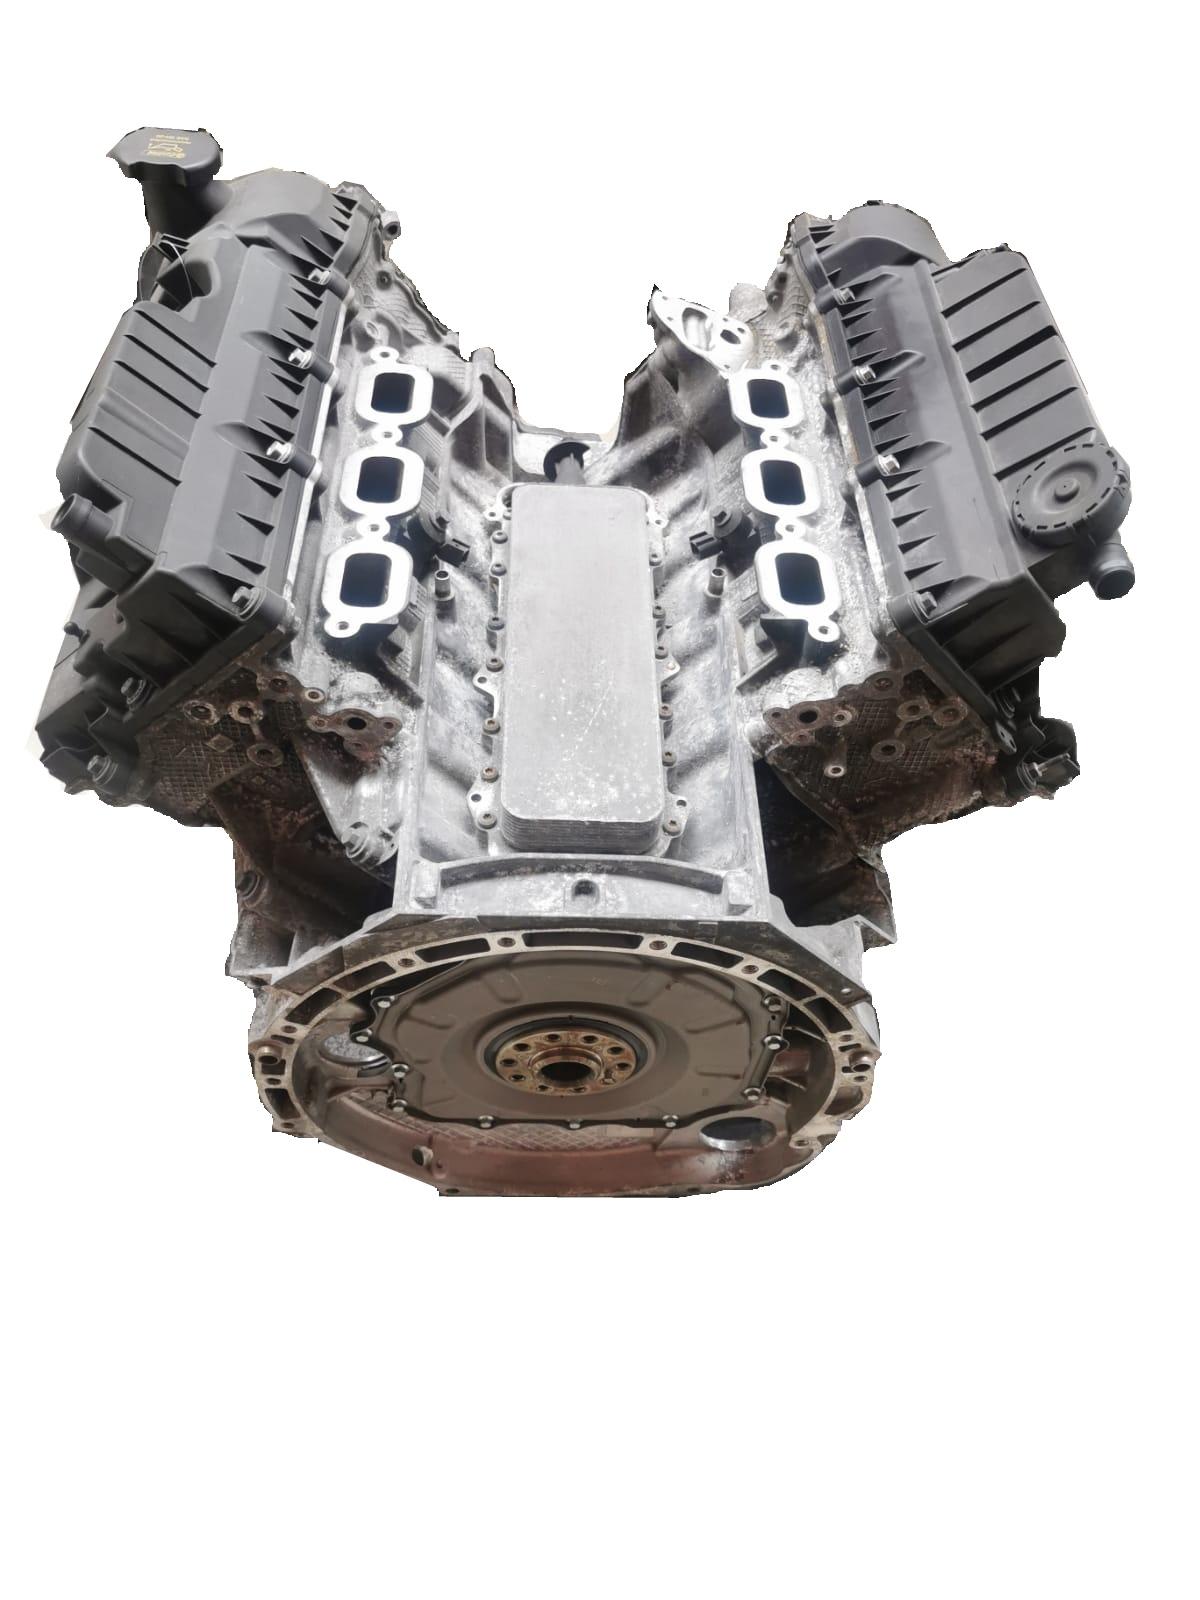 Motor 2016 Jaguar F-Pace X761 3,0 SCV6 AWD 306PS 340 PS